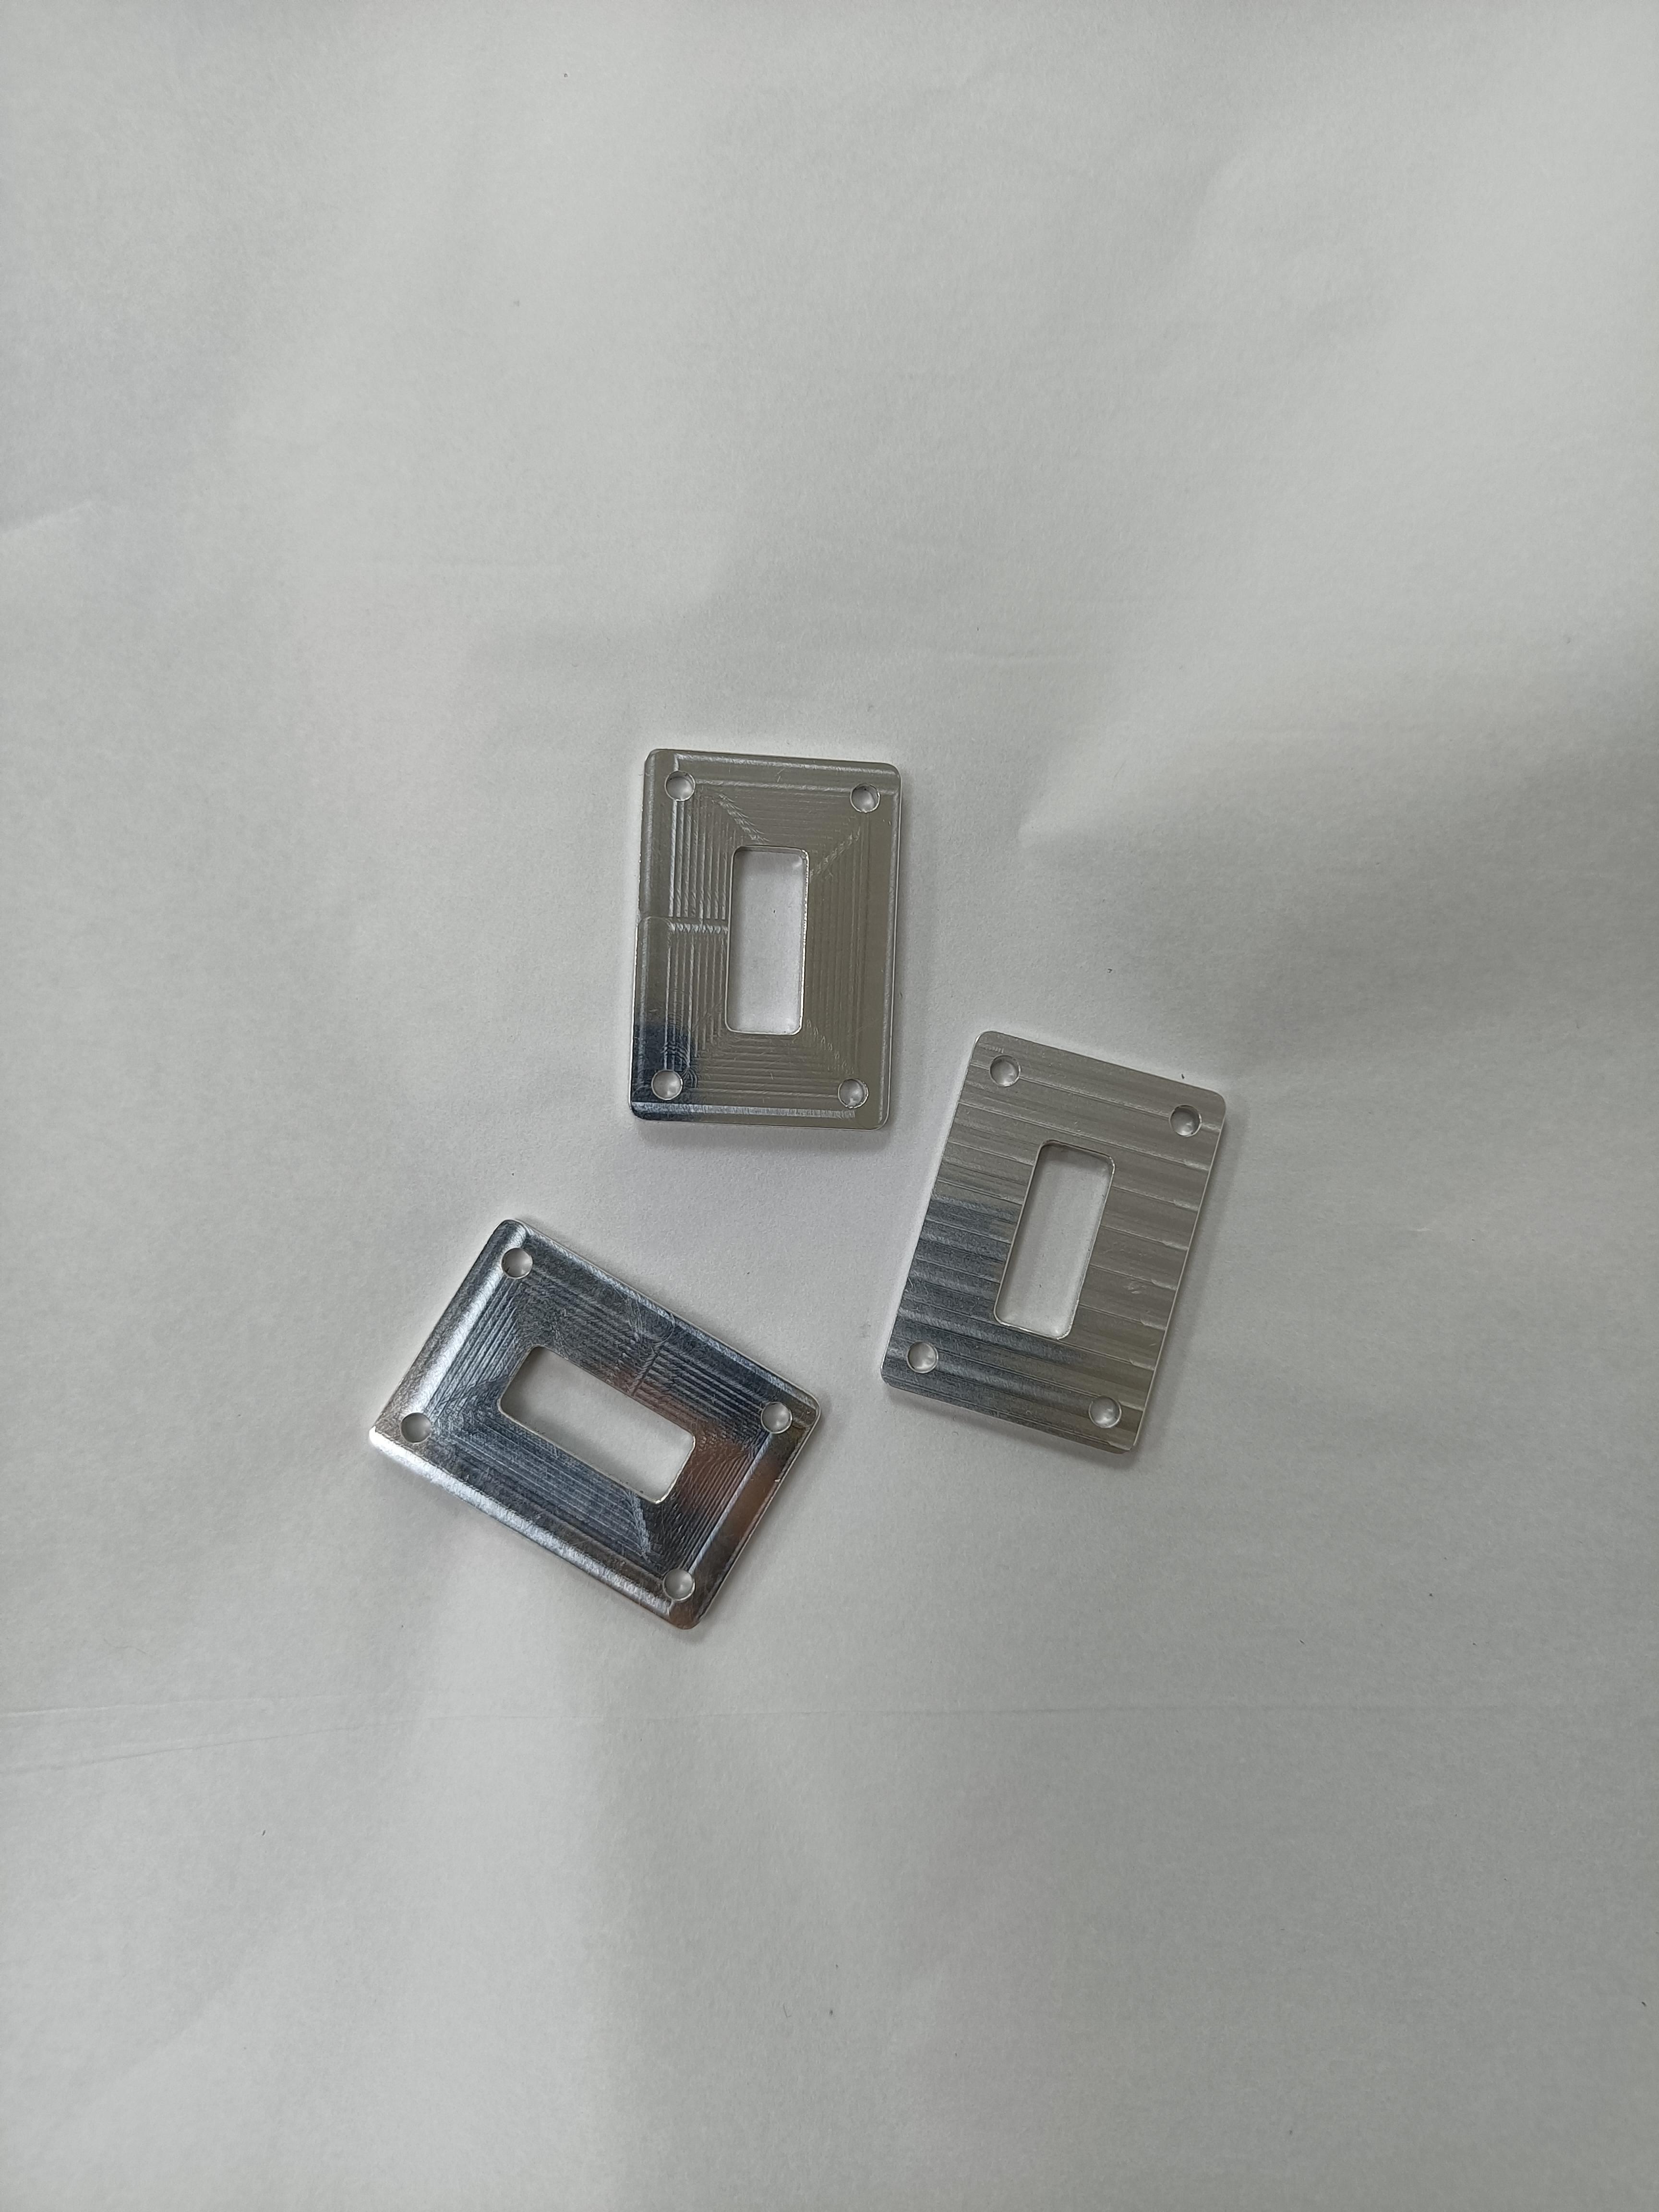 Four small aluminium parts - 3 of each